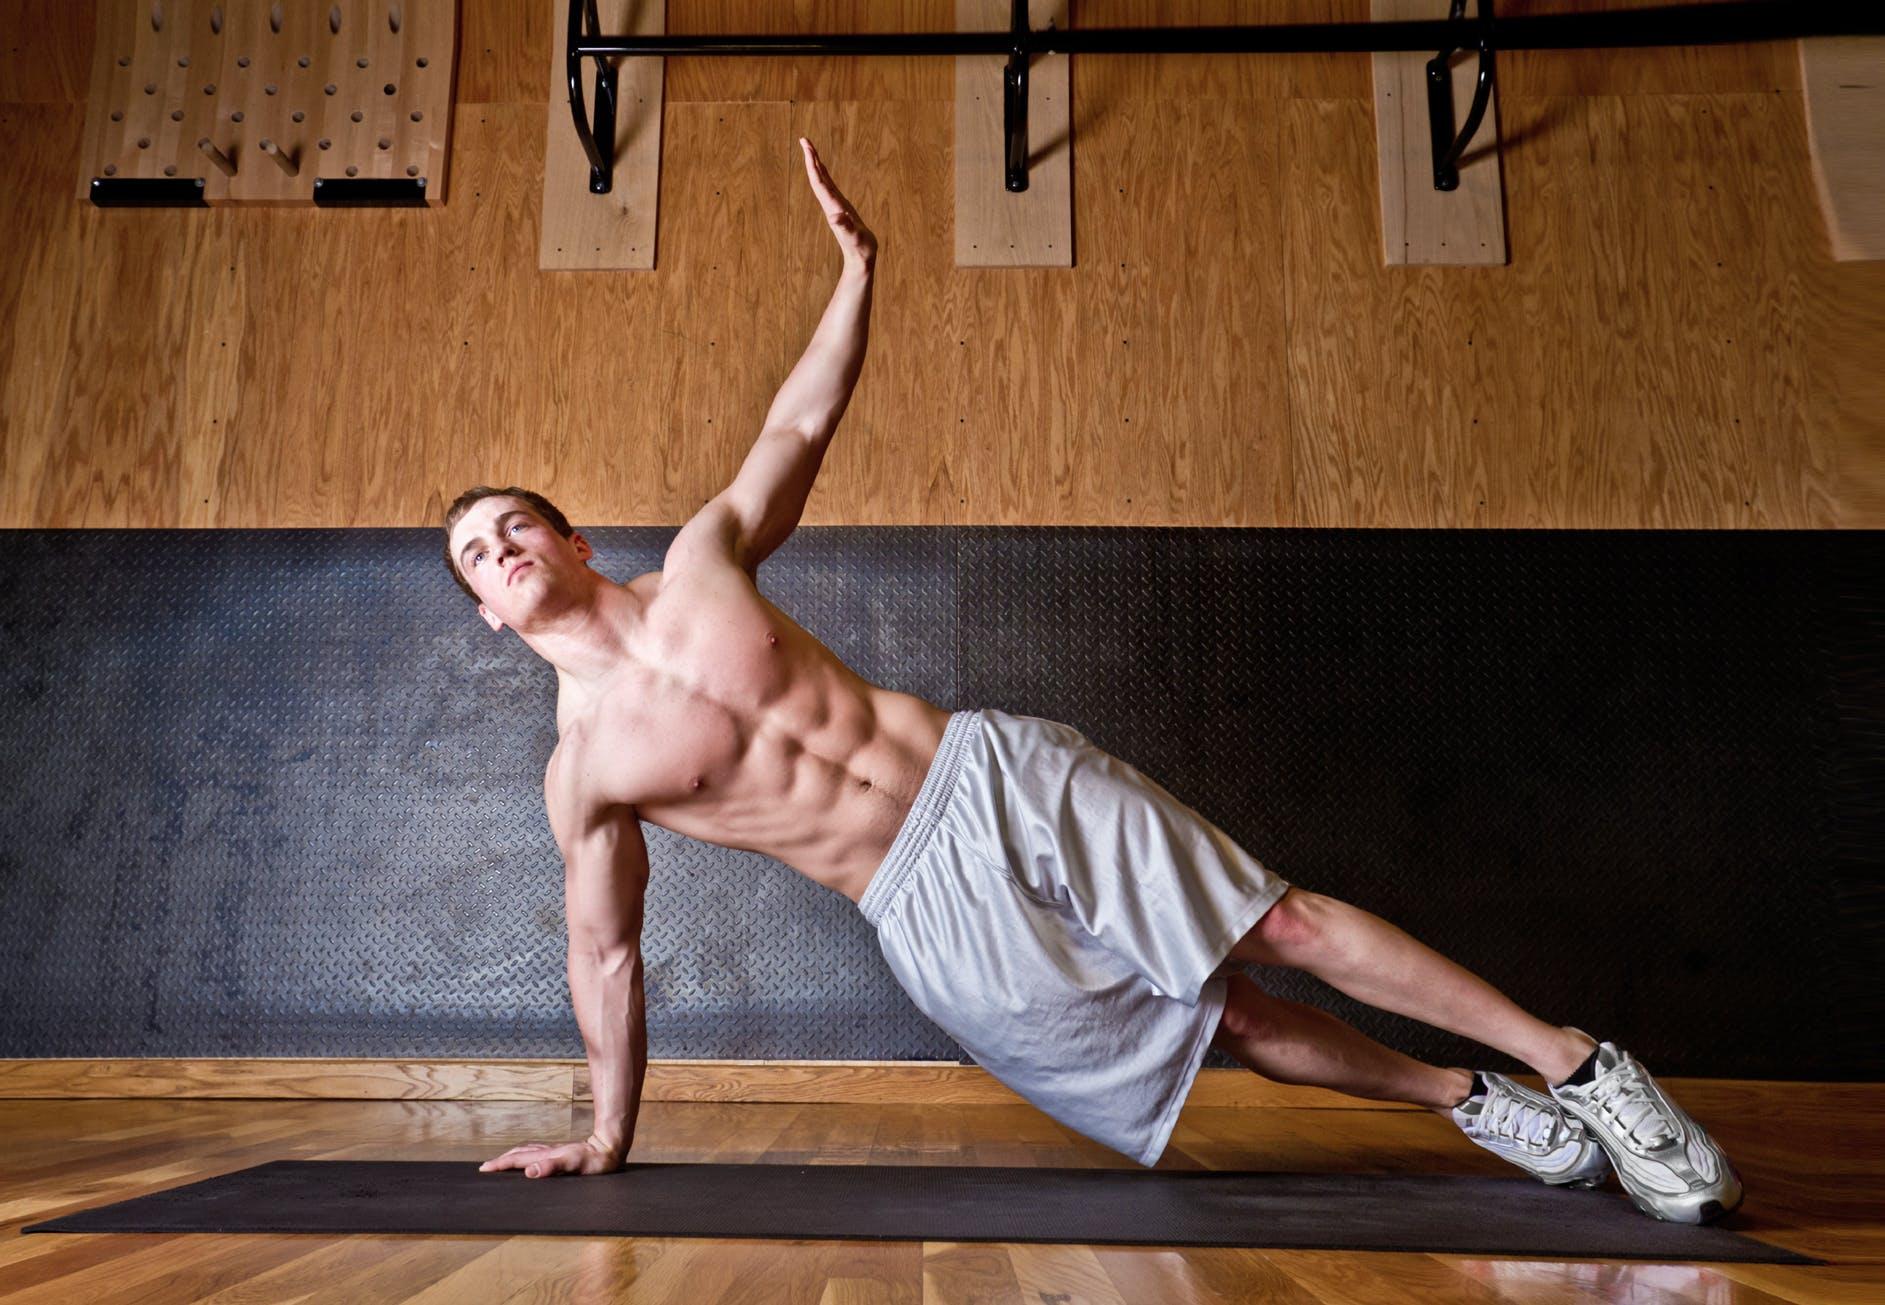 slanking uten trening